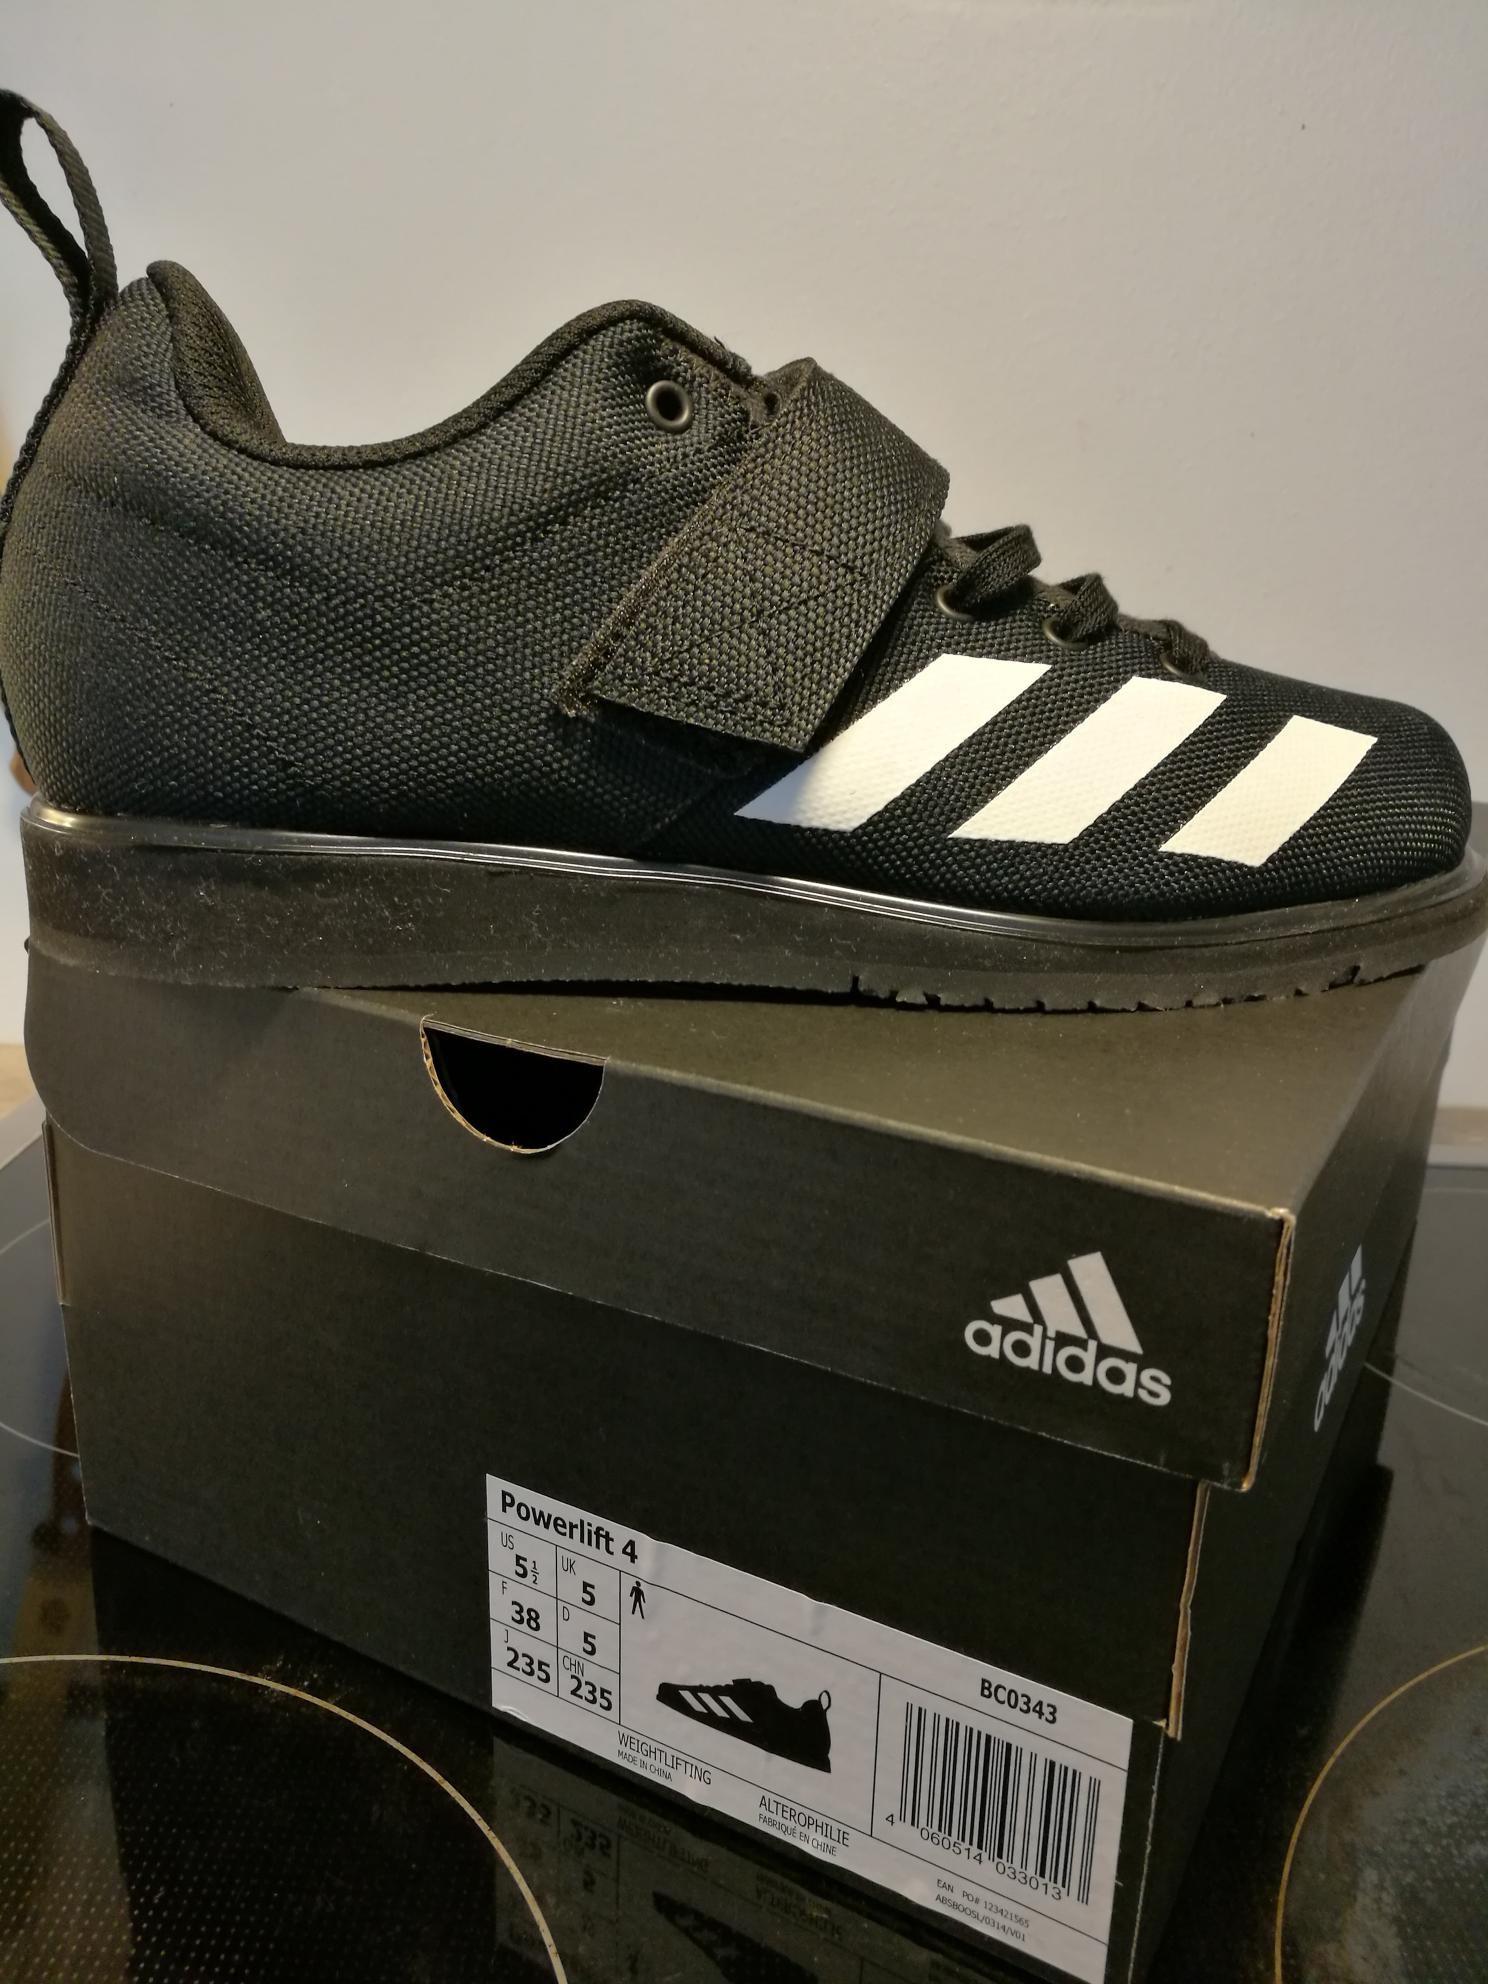 Adidas powerlift sko | FINN.no